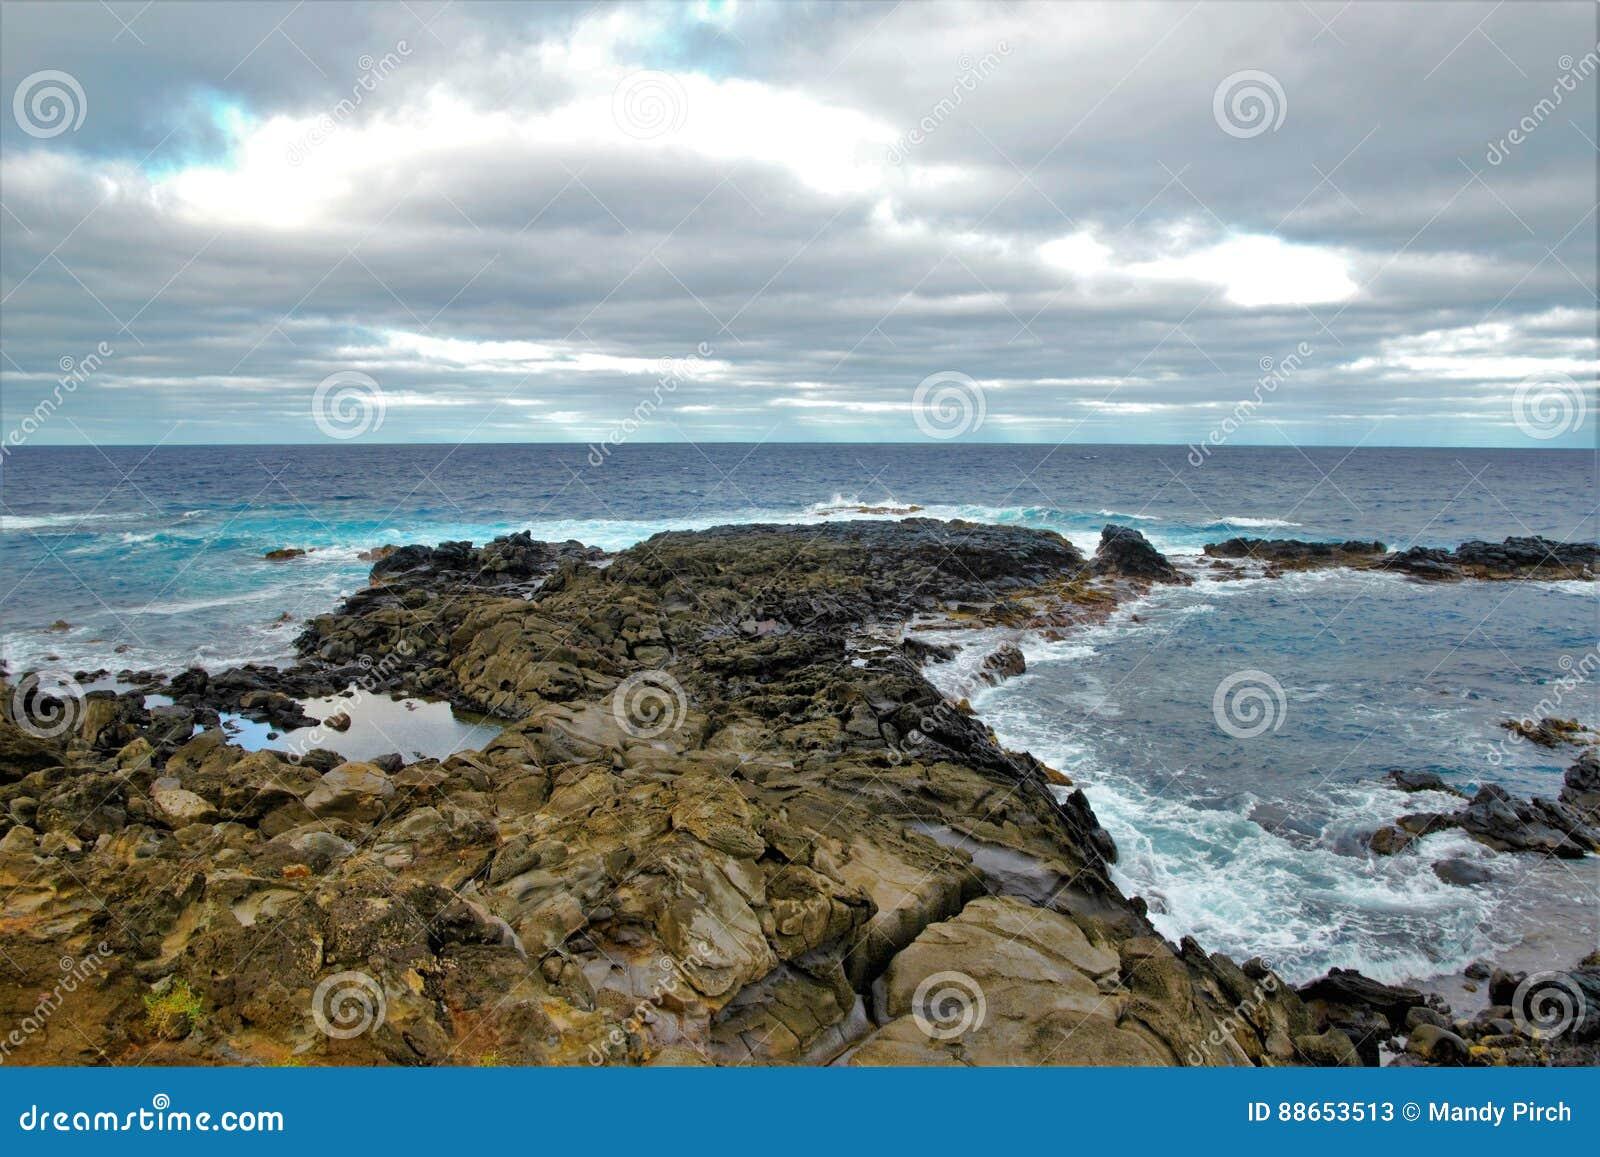 Coasts around Easter Island